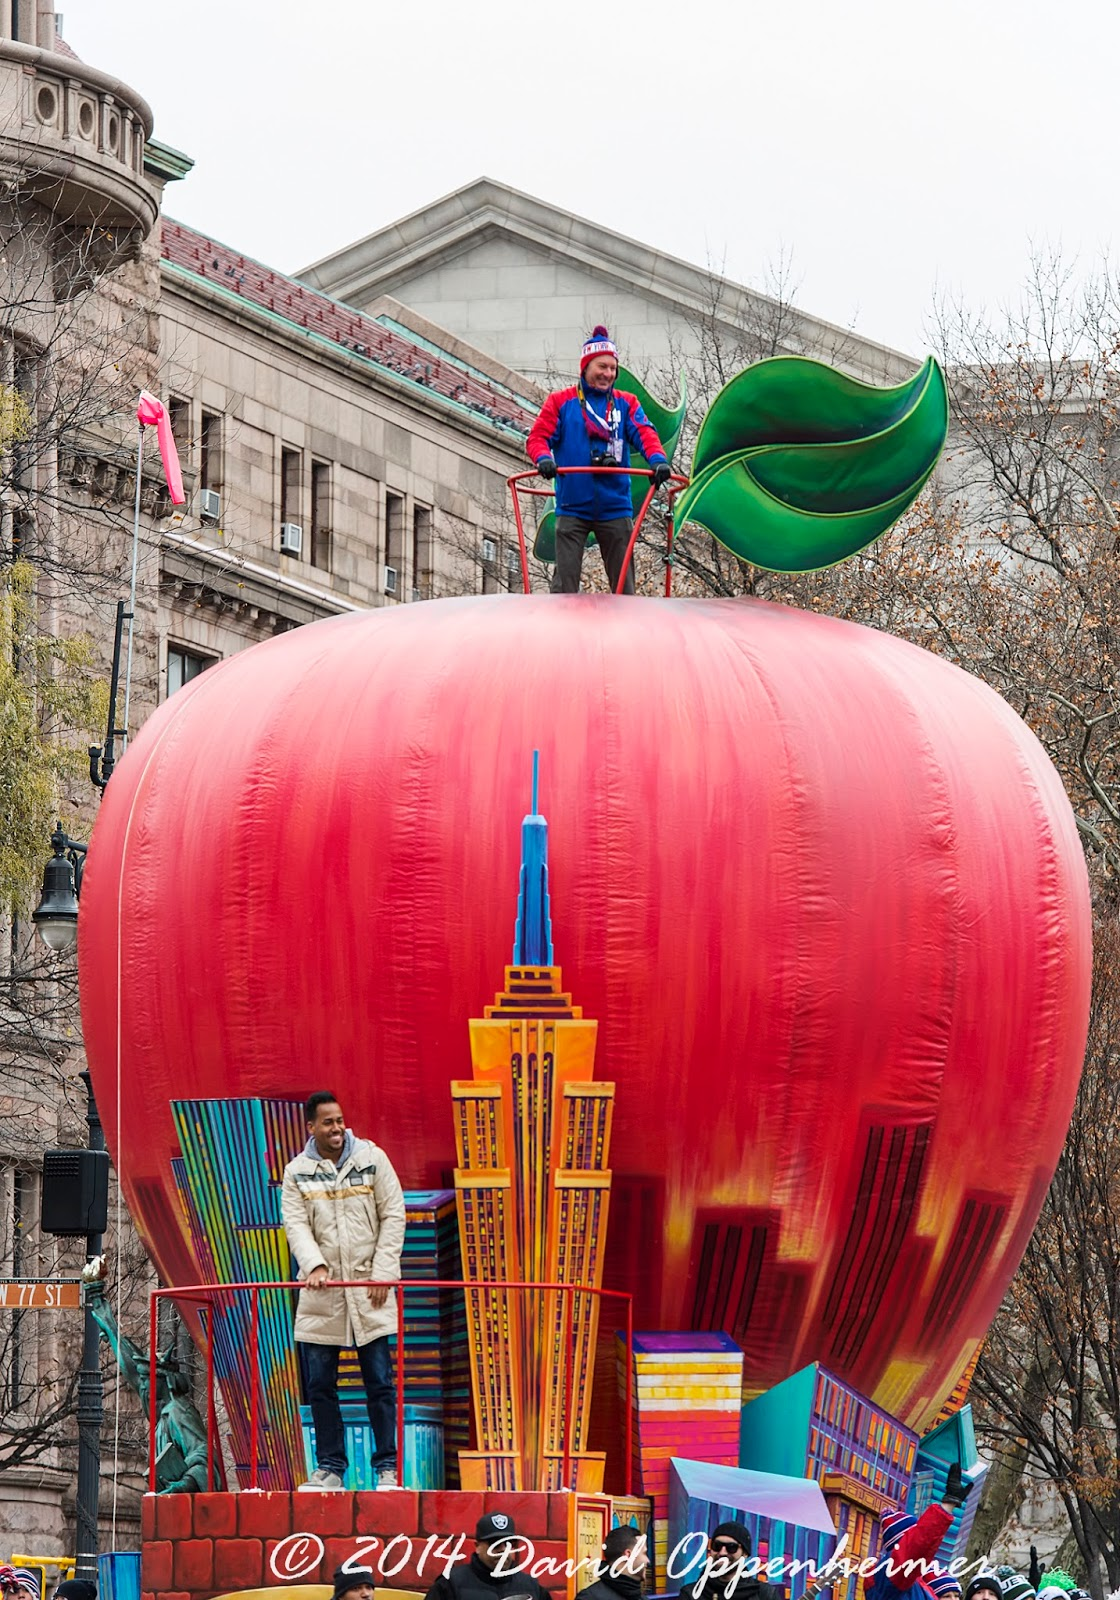 Big Apple by NY Daily News